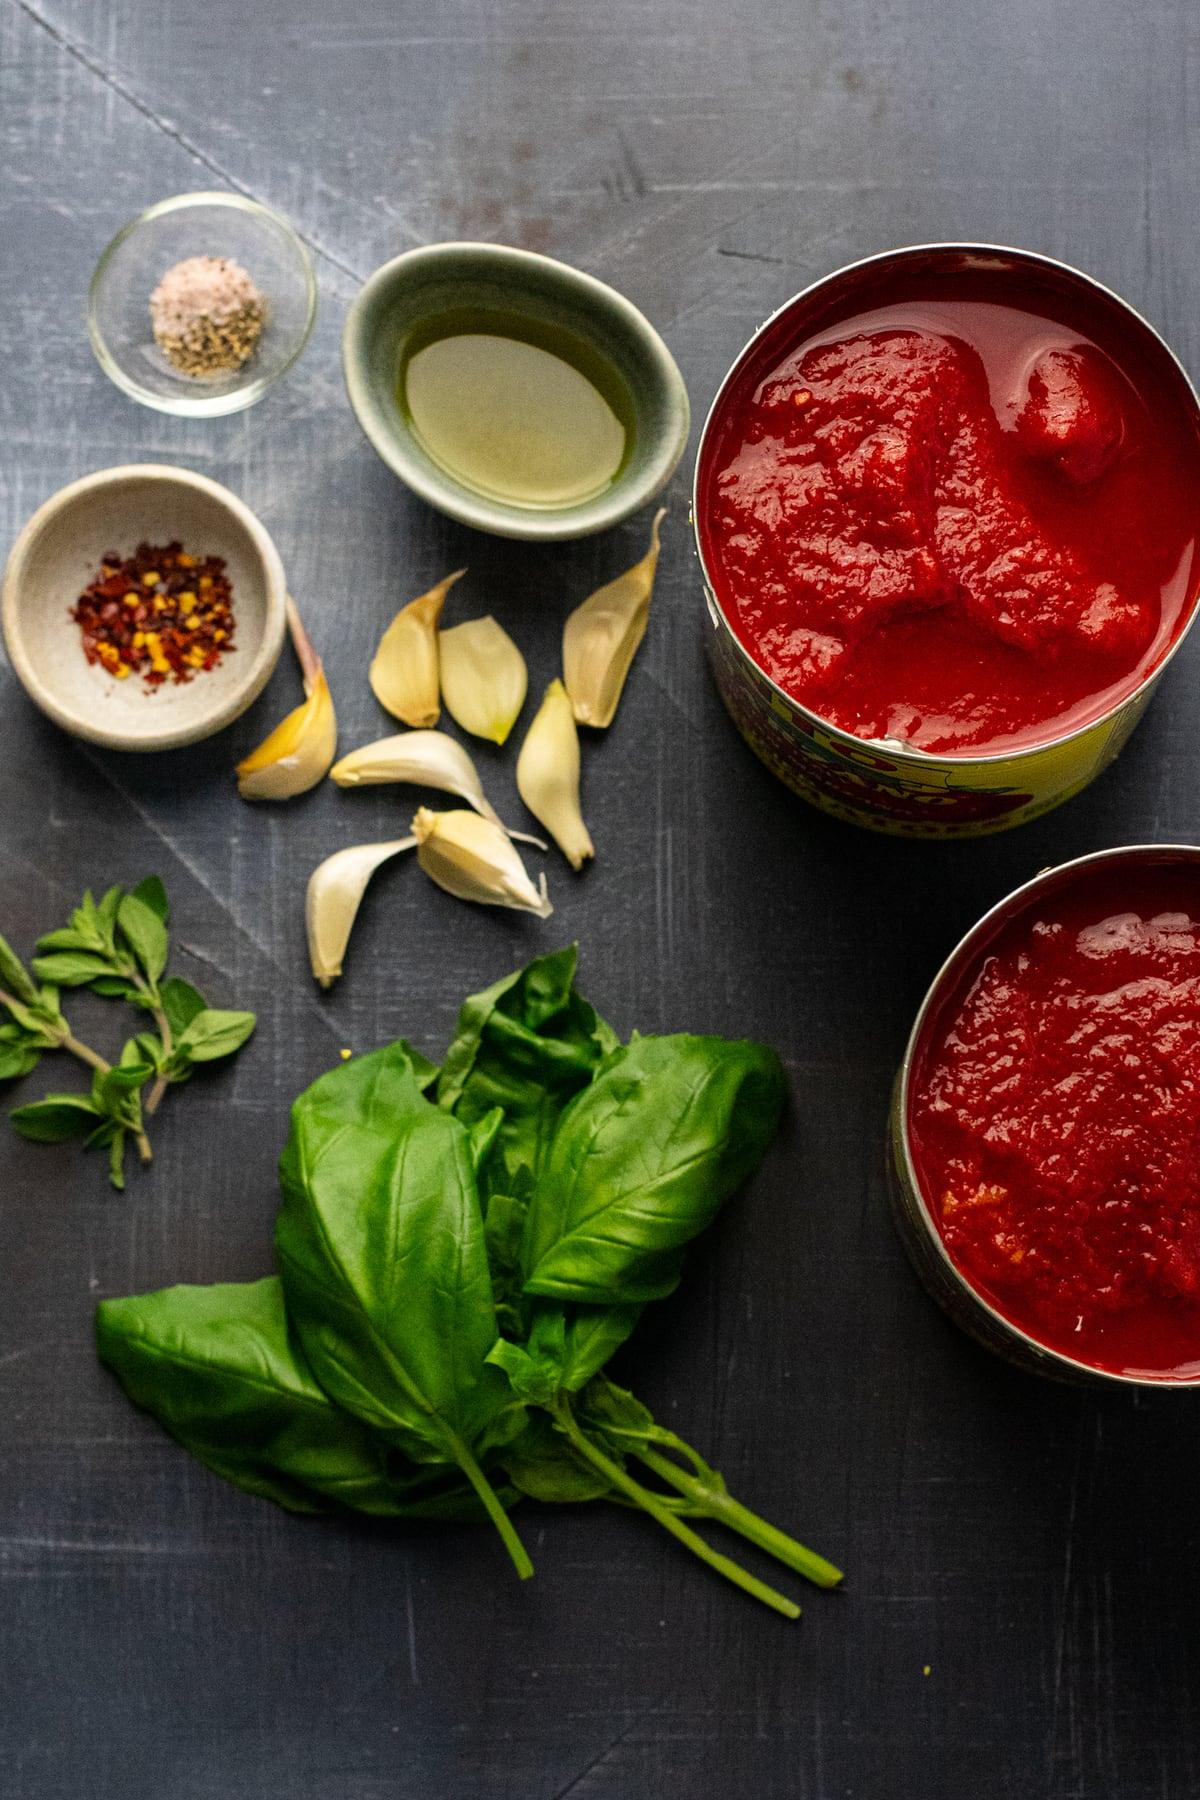 ingredients for arrabbiata tomato sauce arranged on dark gray background.